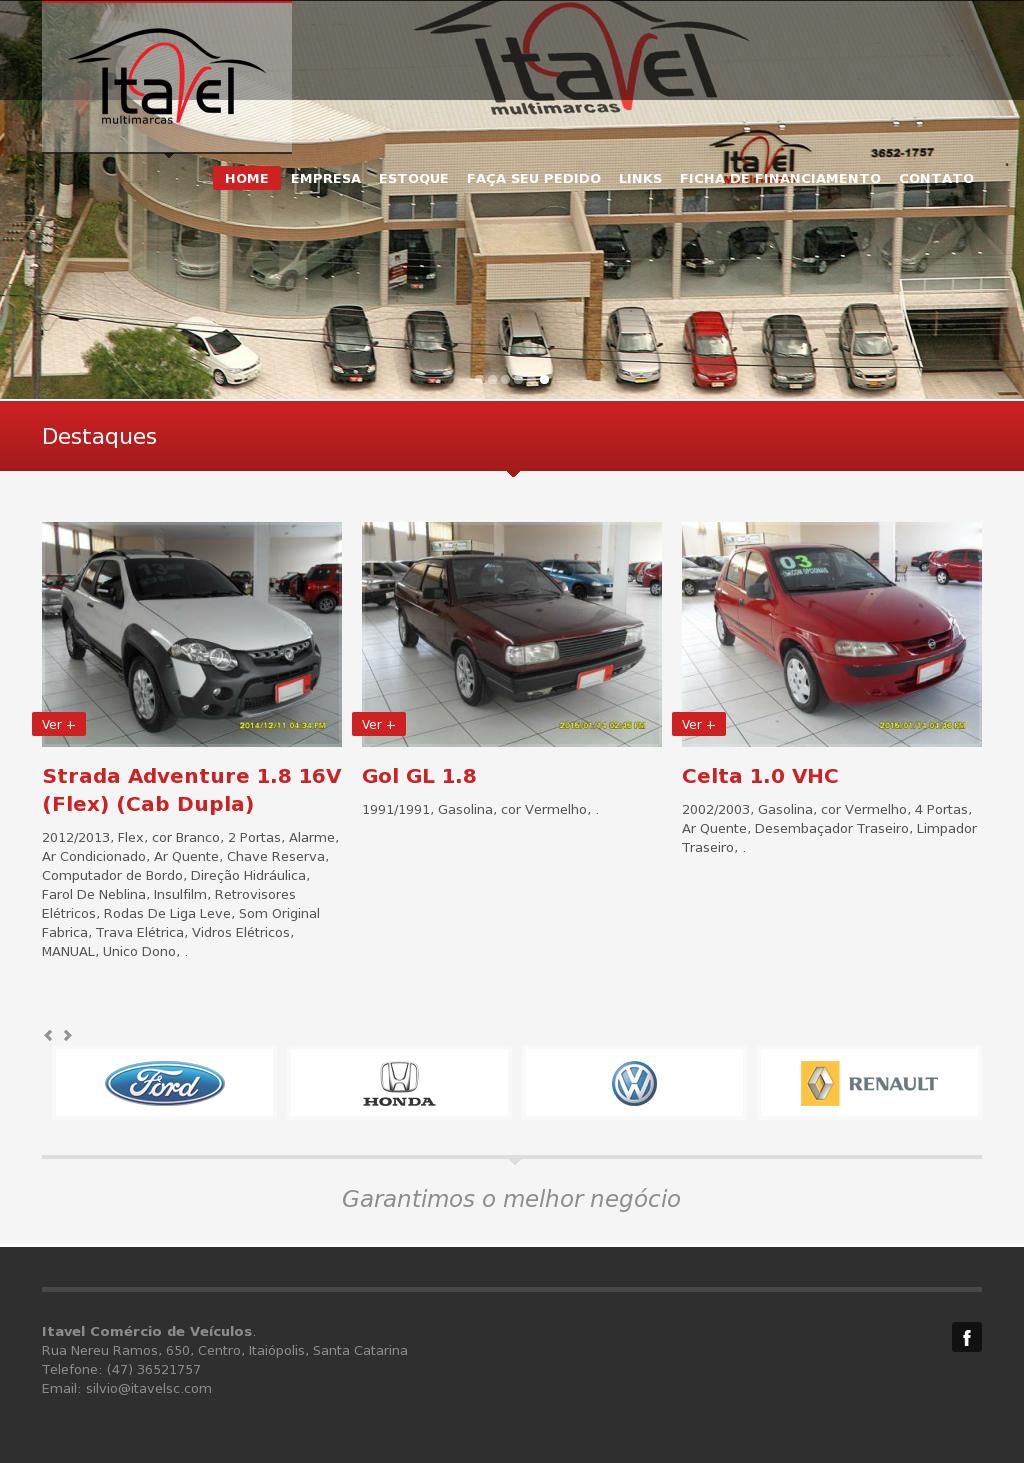 Itavel Multimarcas Competitors, Revenue and Employees - Owler